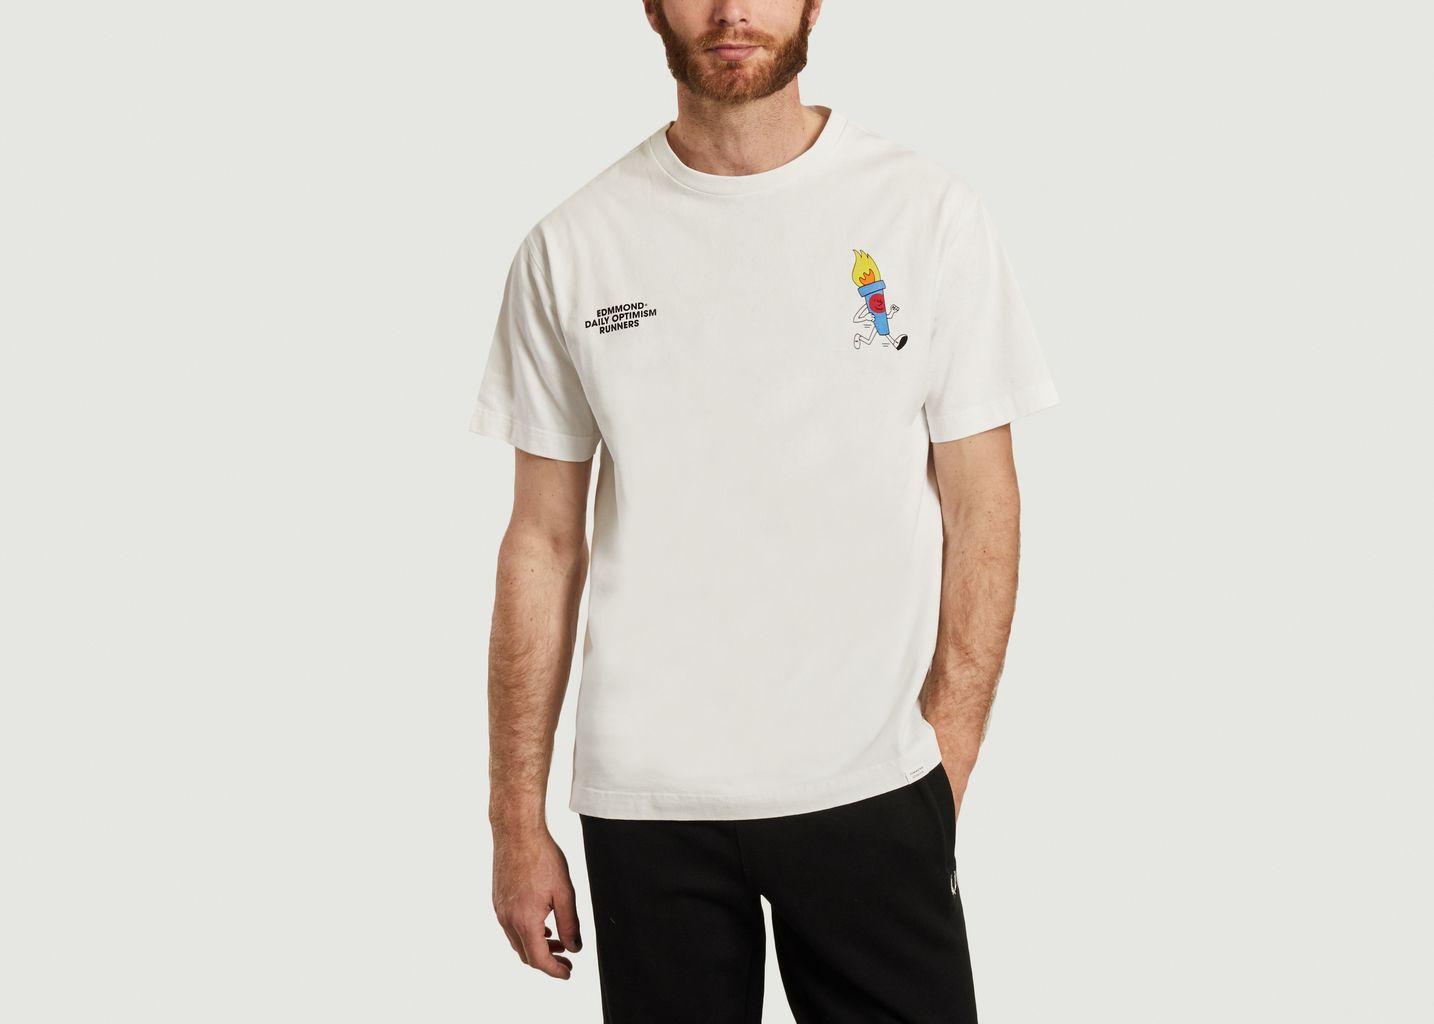 Tee-shirt Daily Optimism - Edmmond Studios